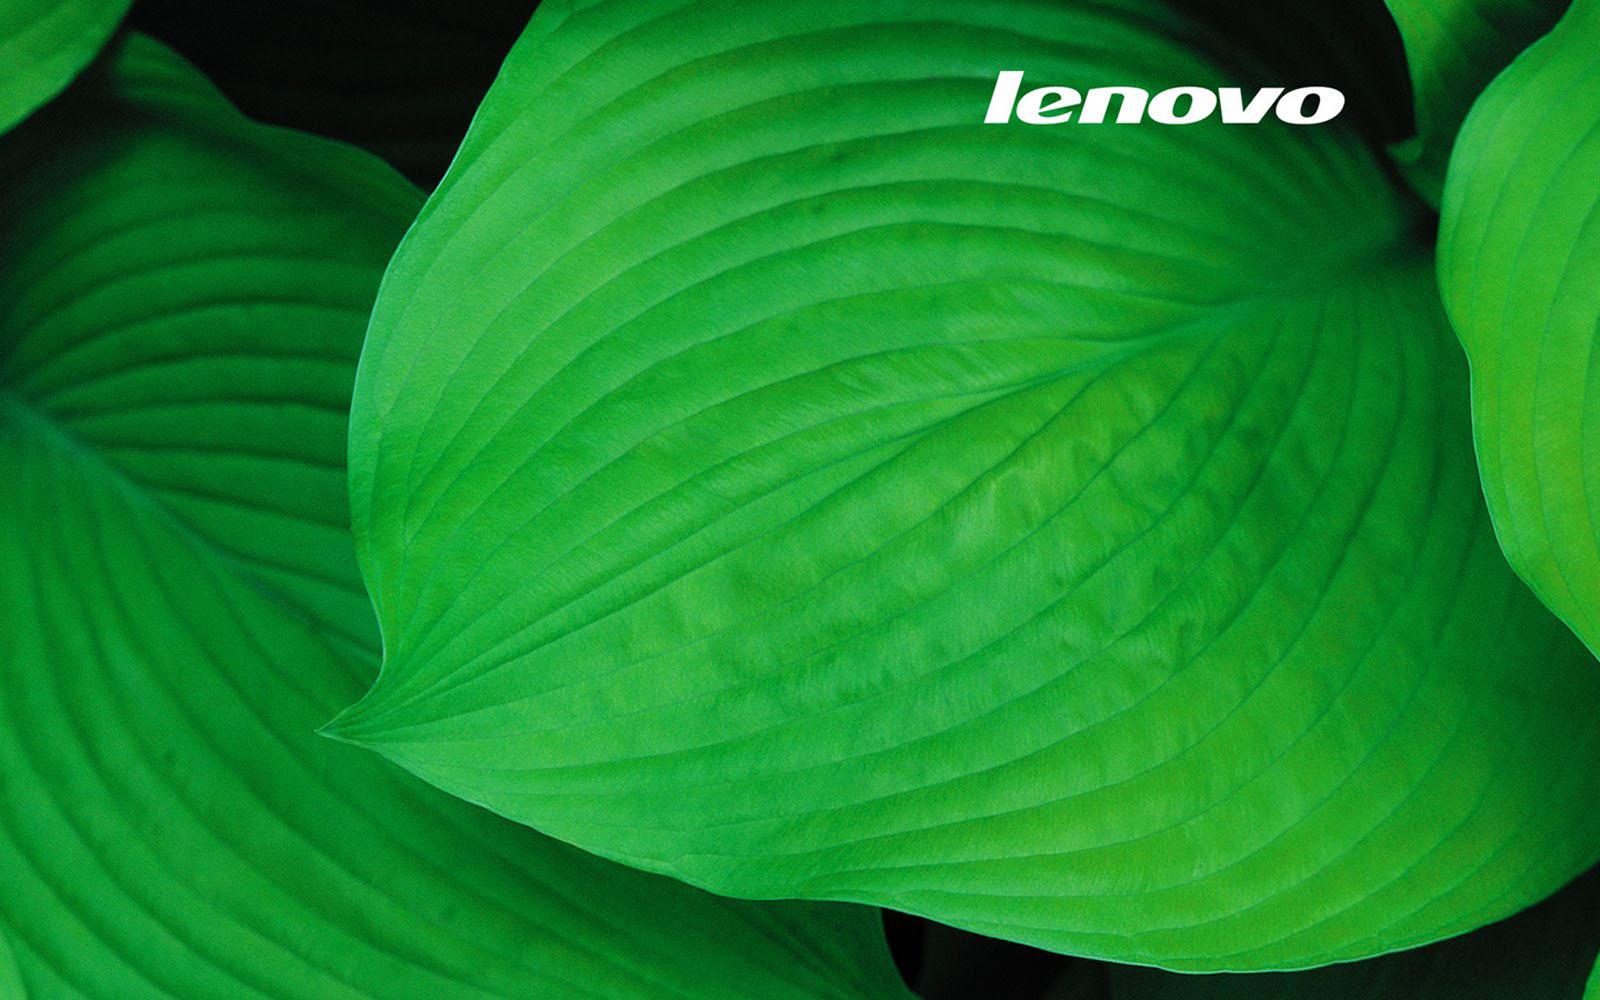 Hd wallpaper lenovo - Lenovo Laptop Wallpapers